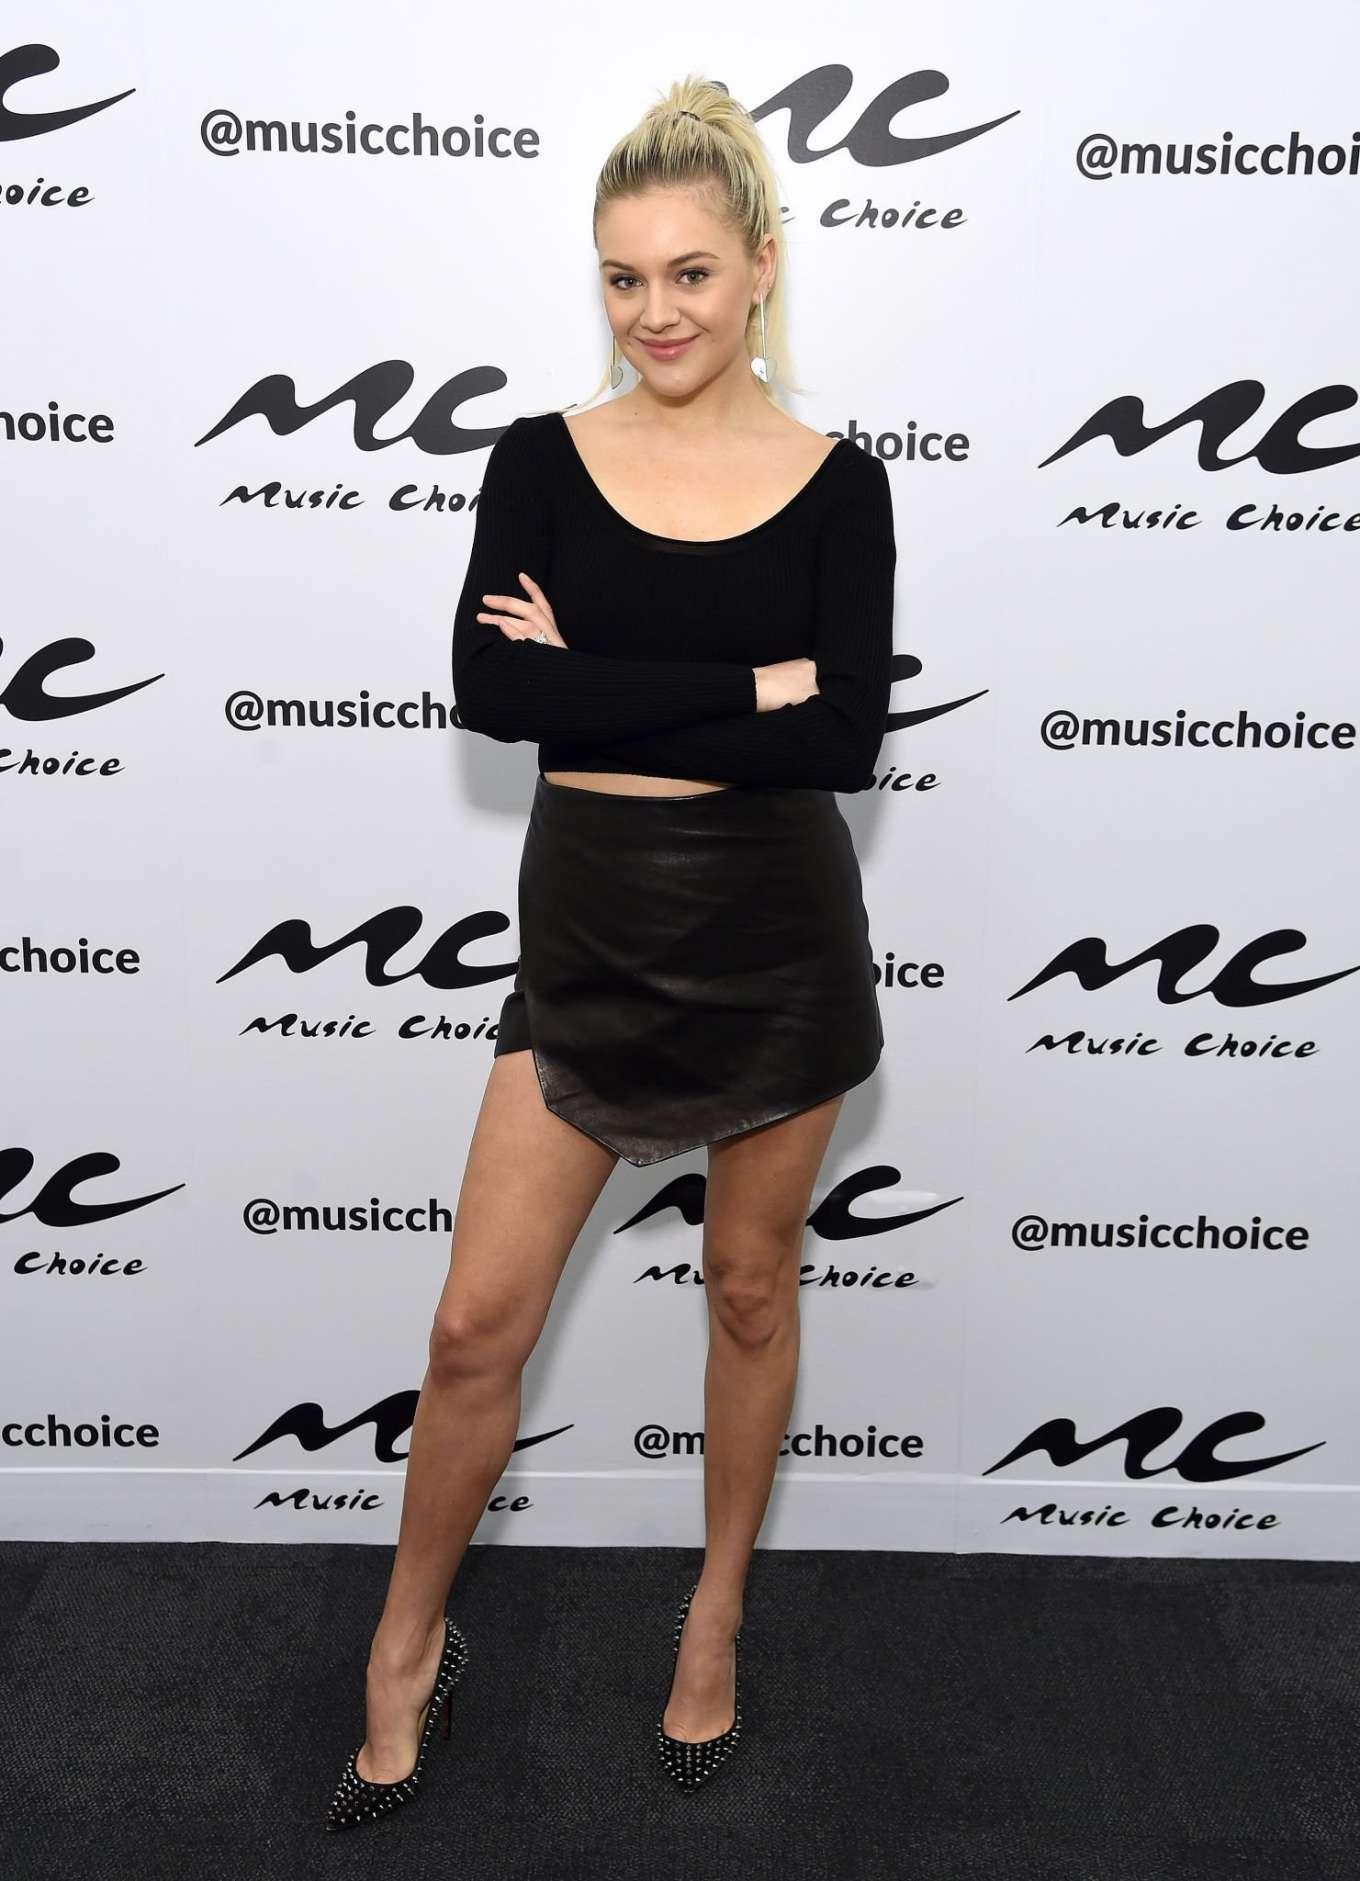 Kelsea Ballerini 2020 : Kelsea Ballerini visiting Music Choice in NYC-15